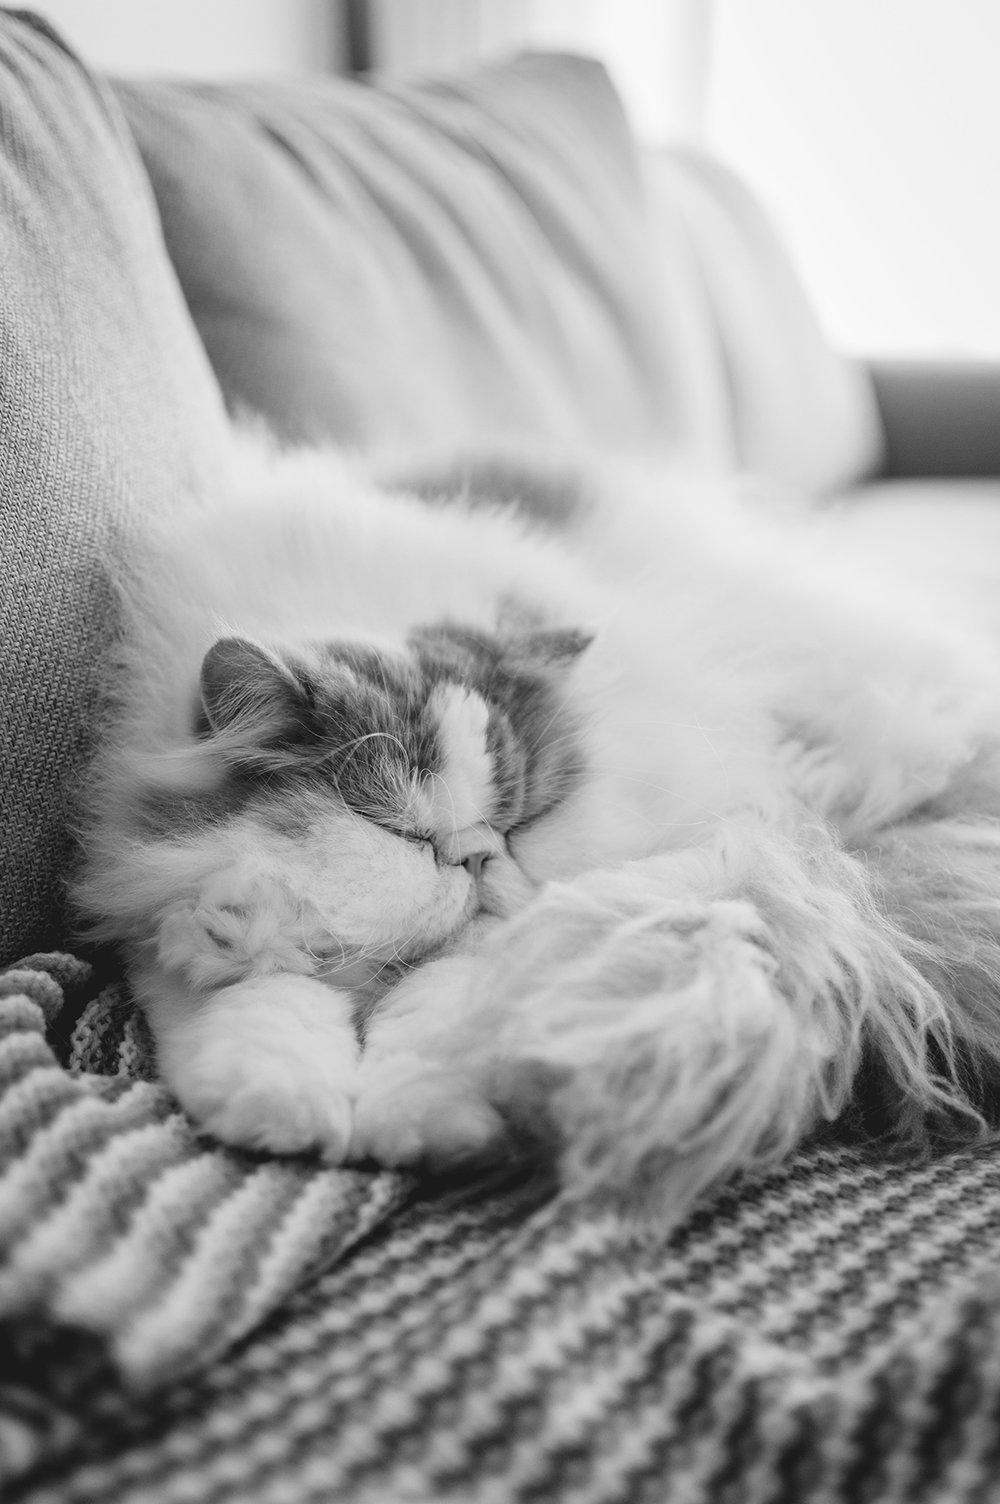 darwin-sleeping-cat-Patricia-Martins-Yellowish-2019.jpg